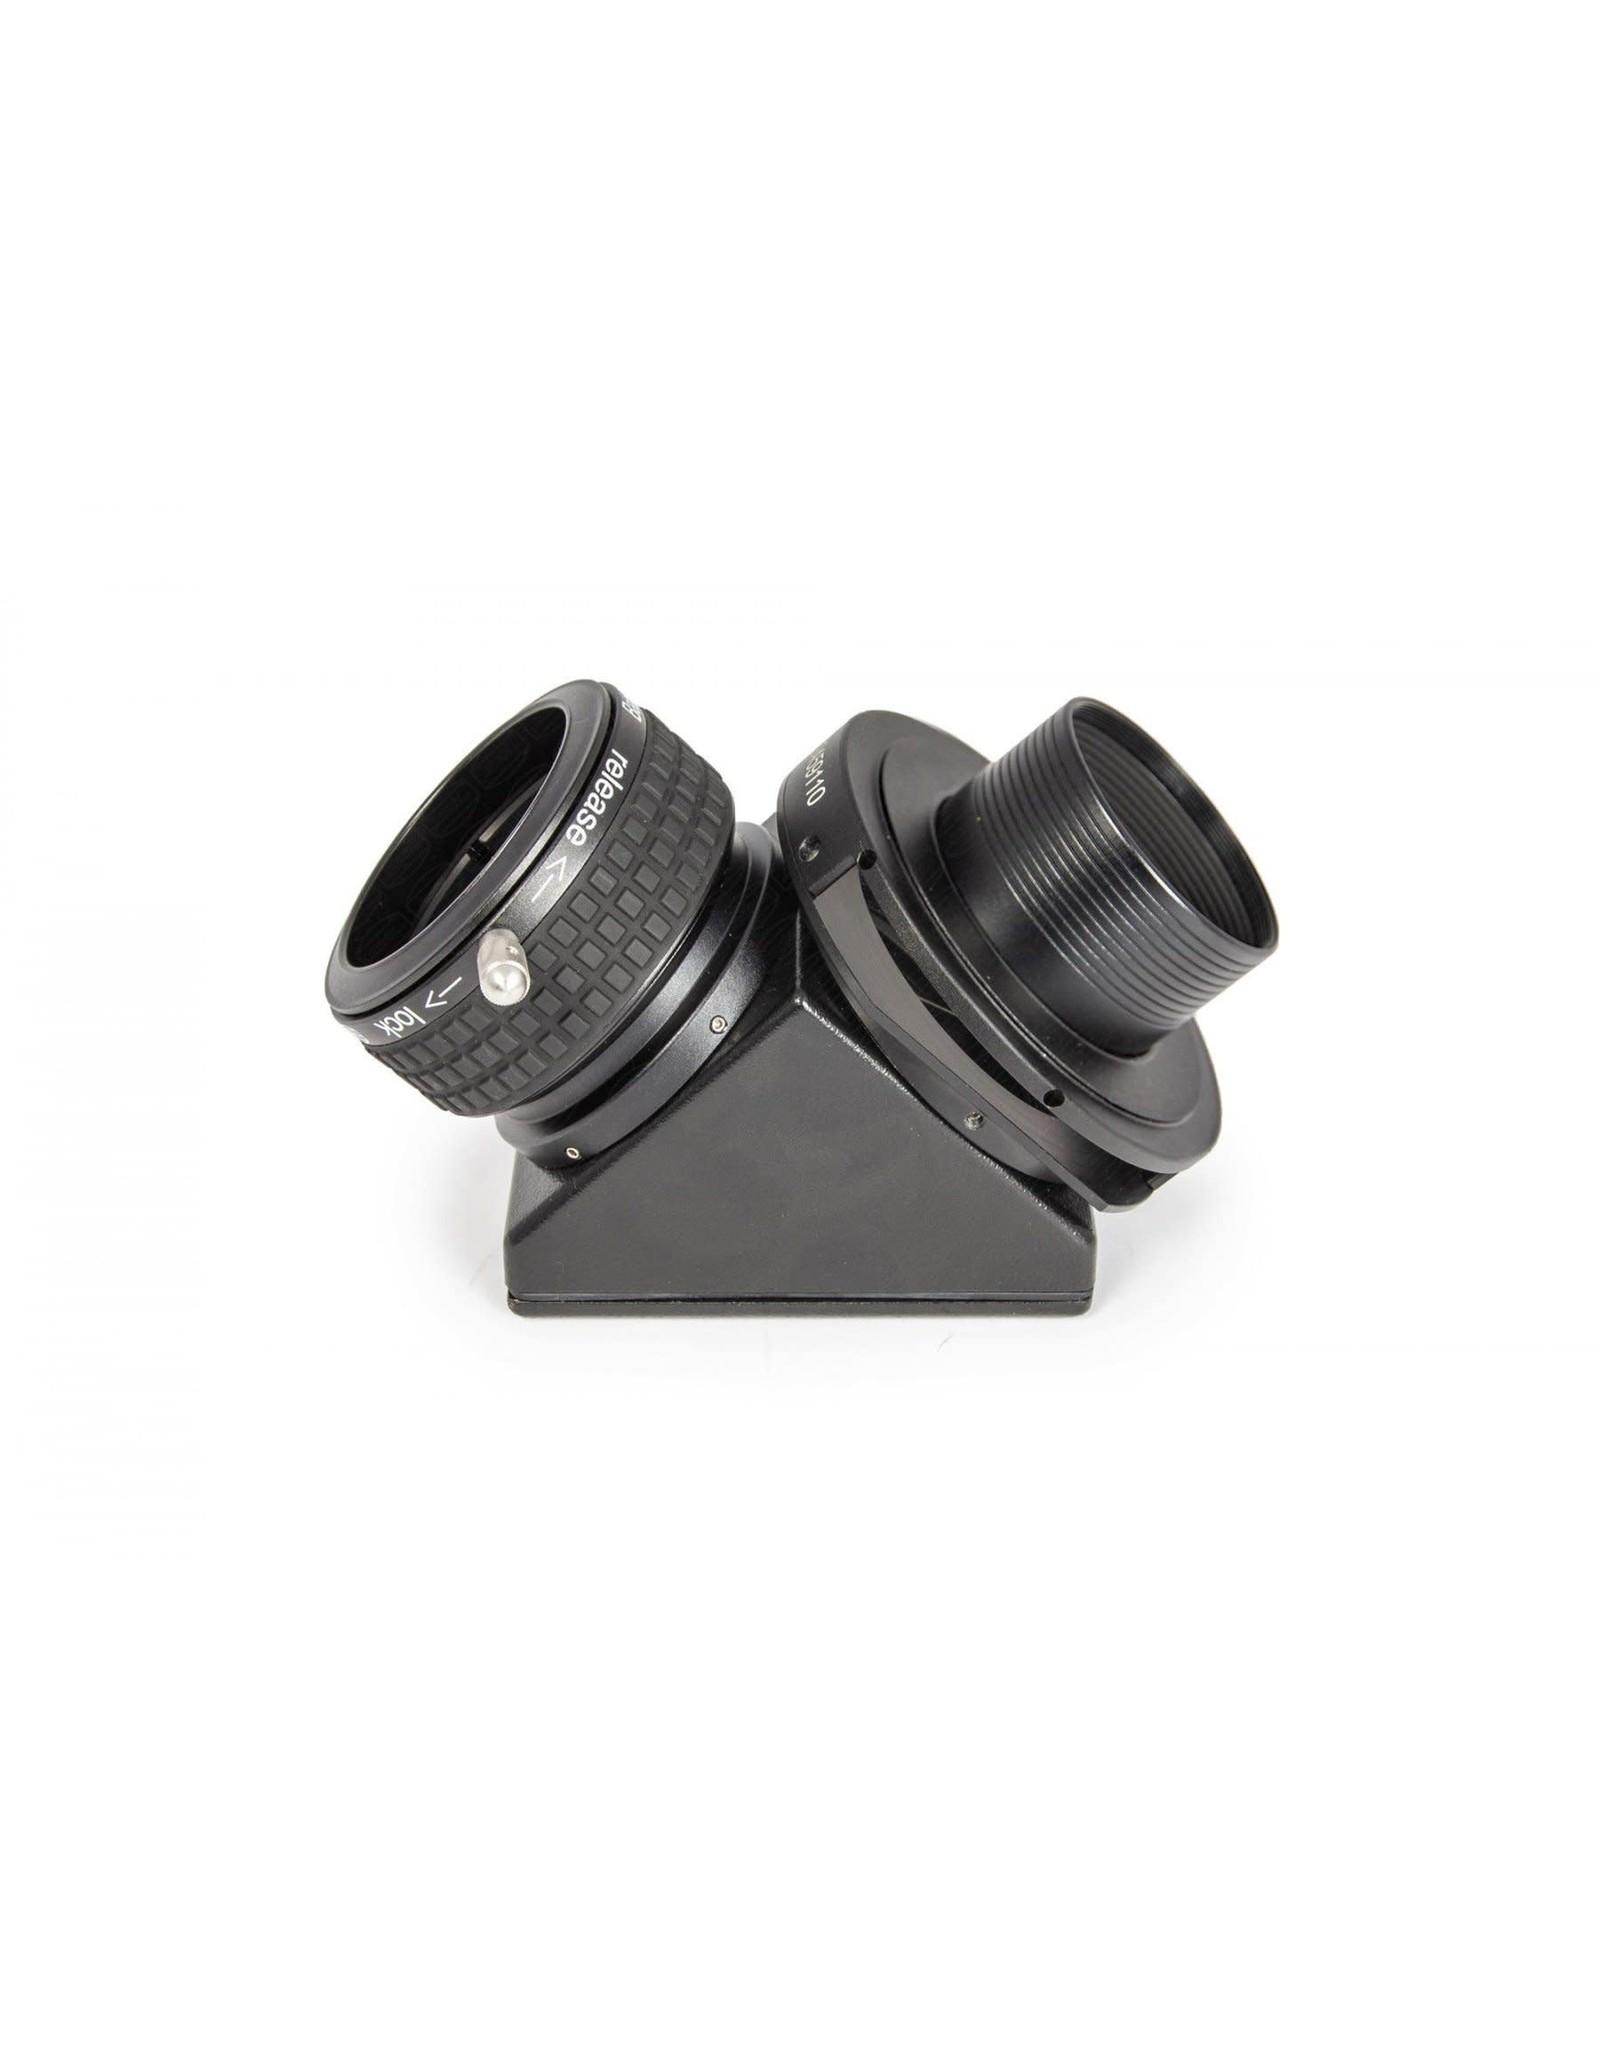 Baader Planetarium Baader UFC S58 dovetail Camera-Adapter (Optical height: 7.2 mm)